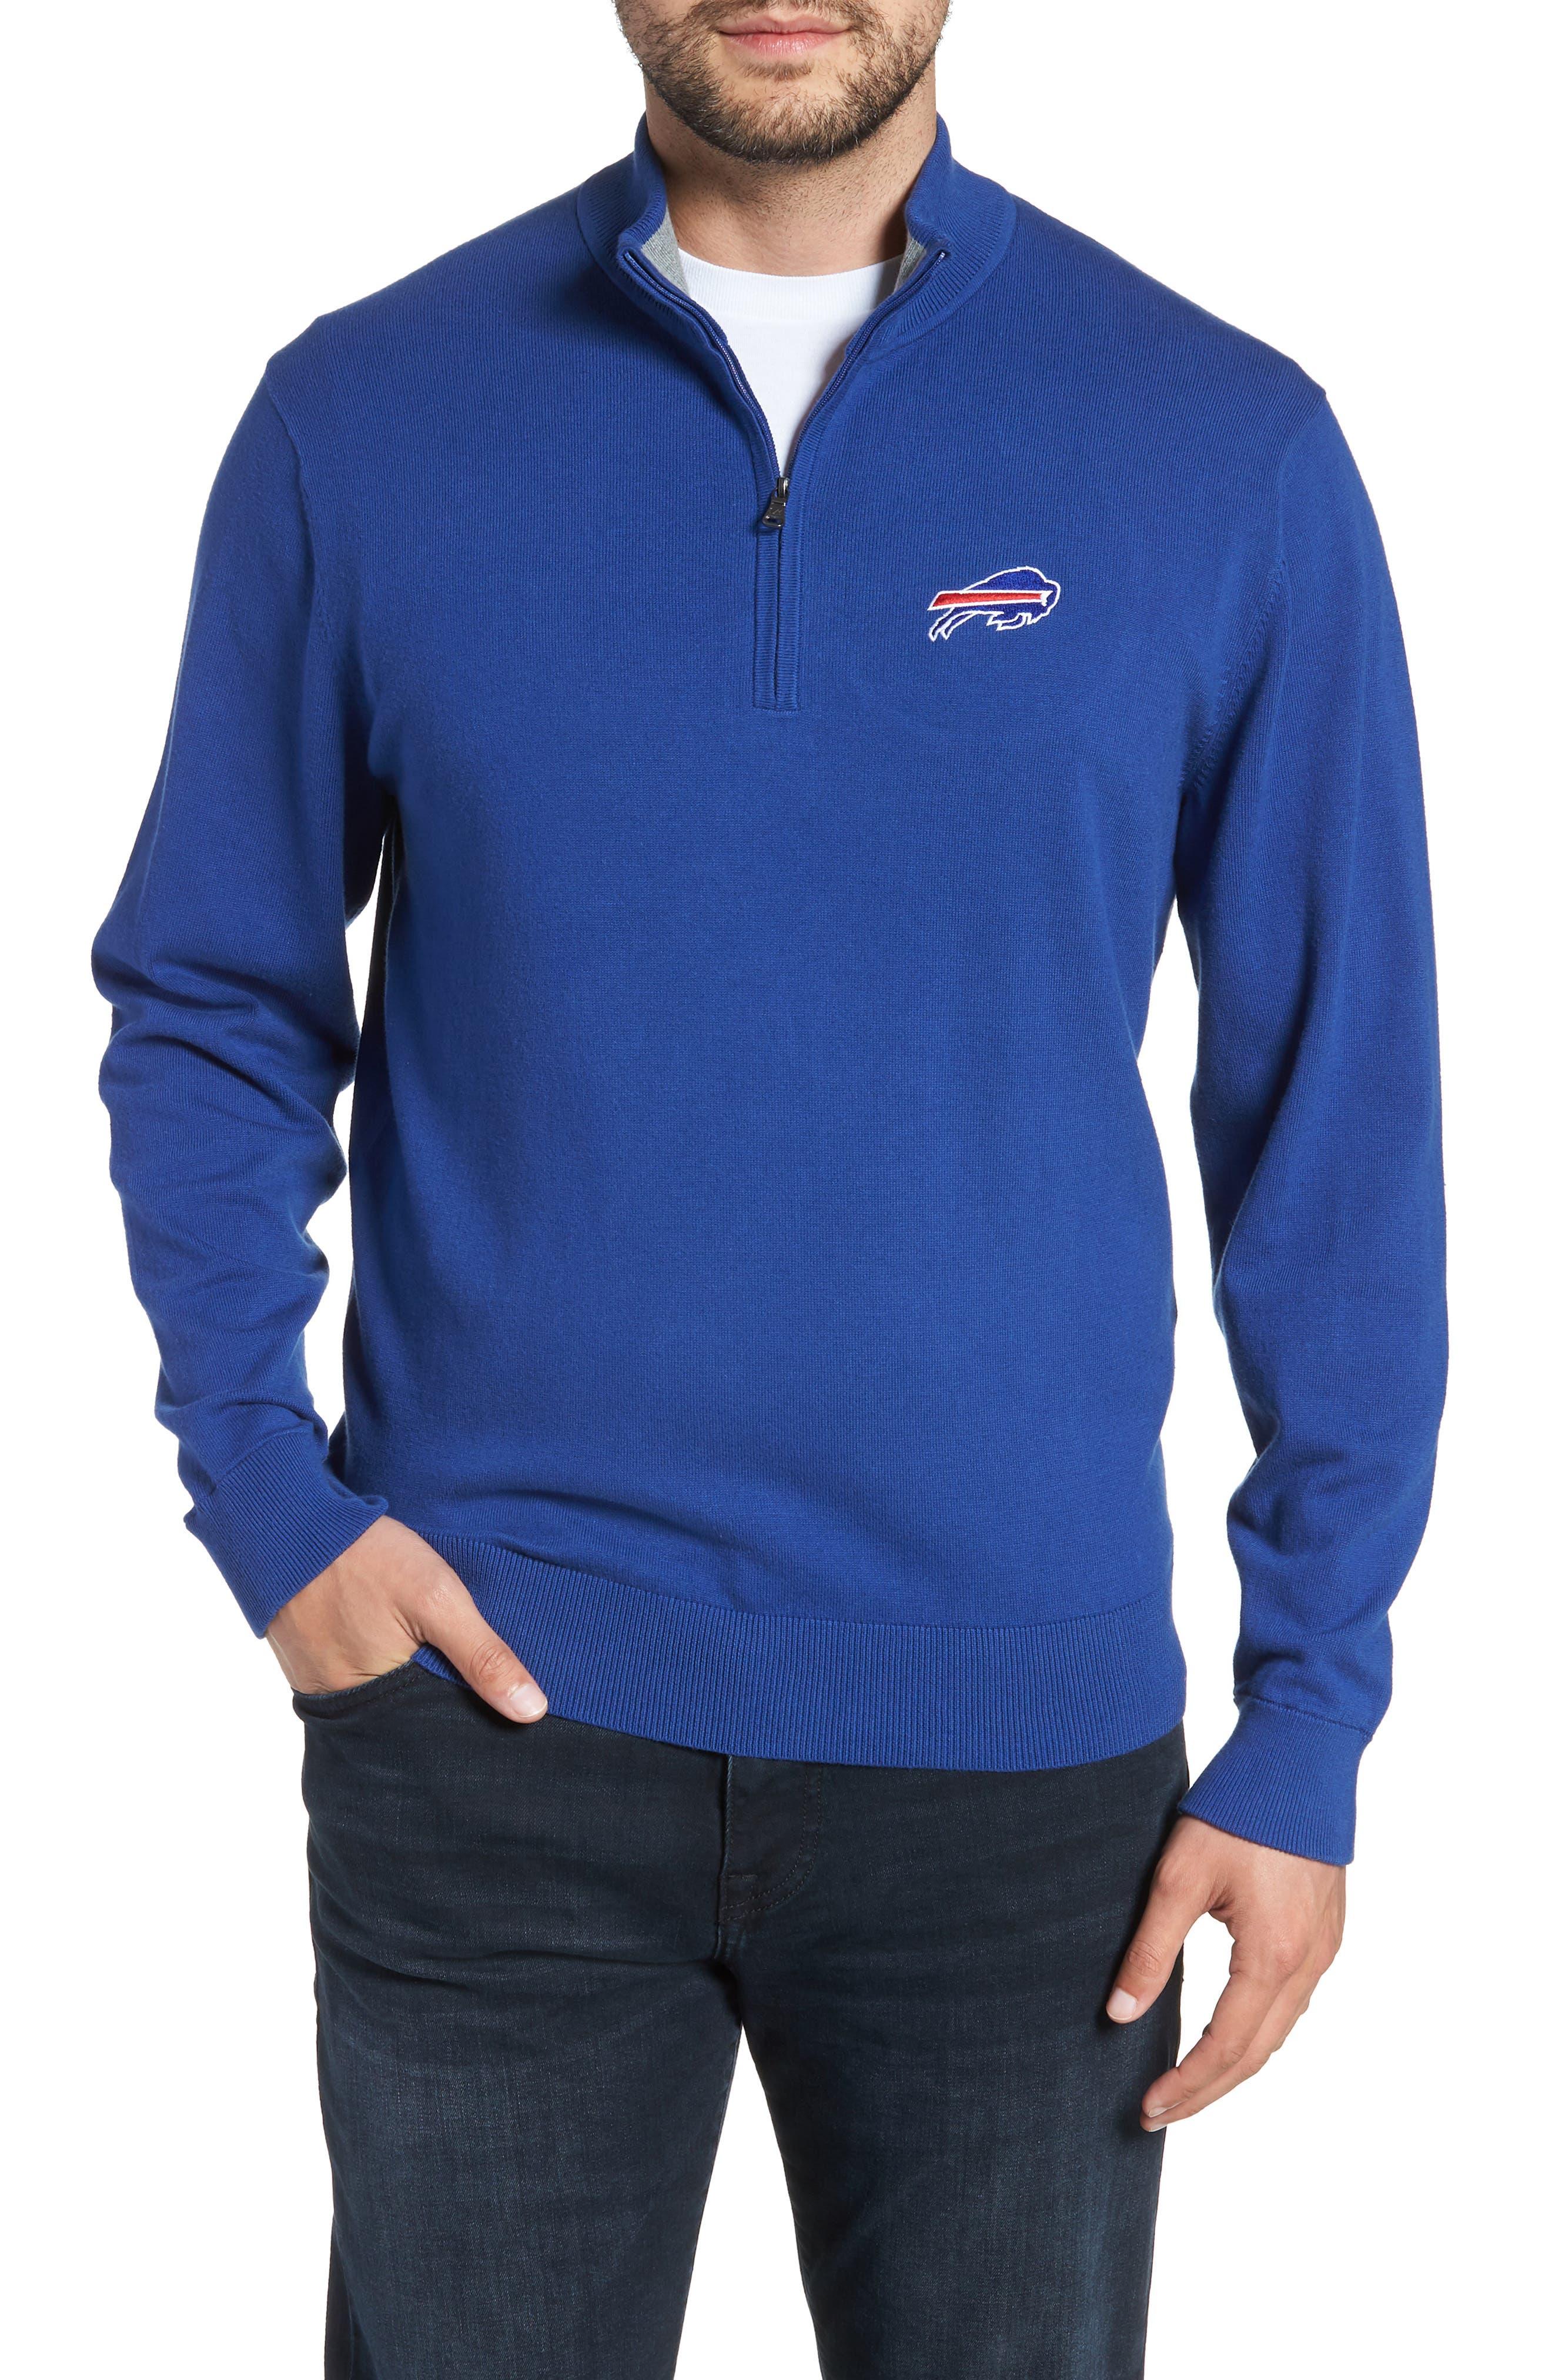 Buffalo Bills - Lakemont Regular Fit Quarter Zip Sweater,                         Main,                         color, TOUR BLUE